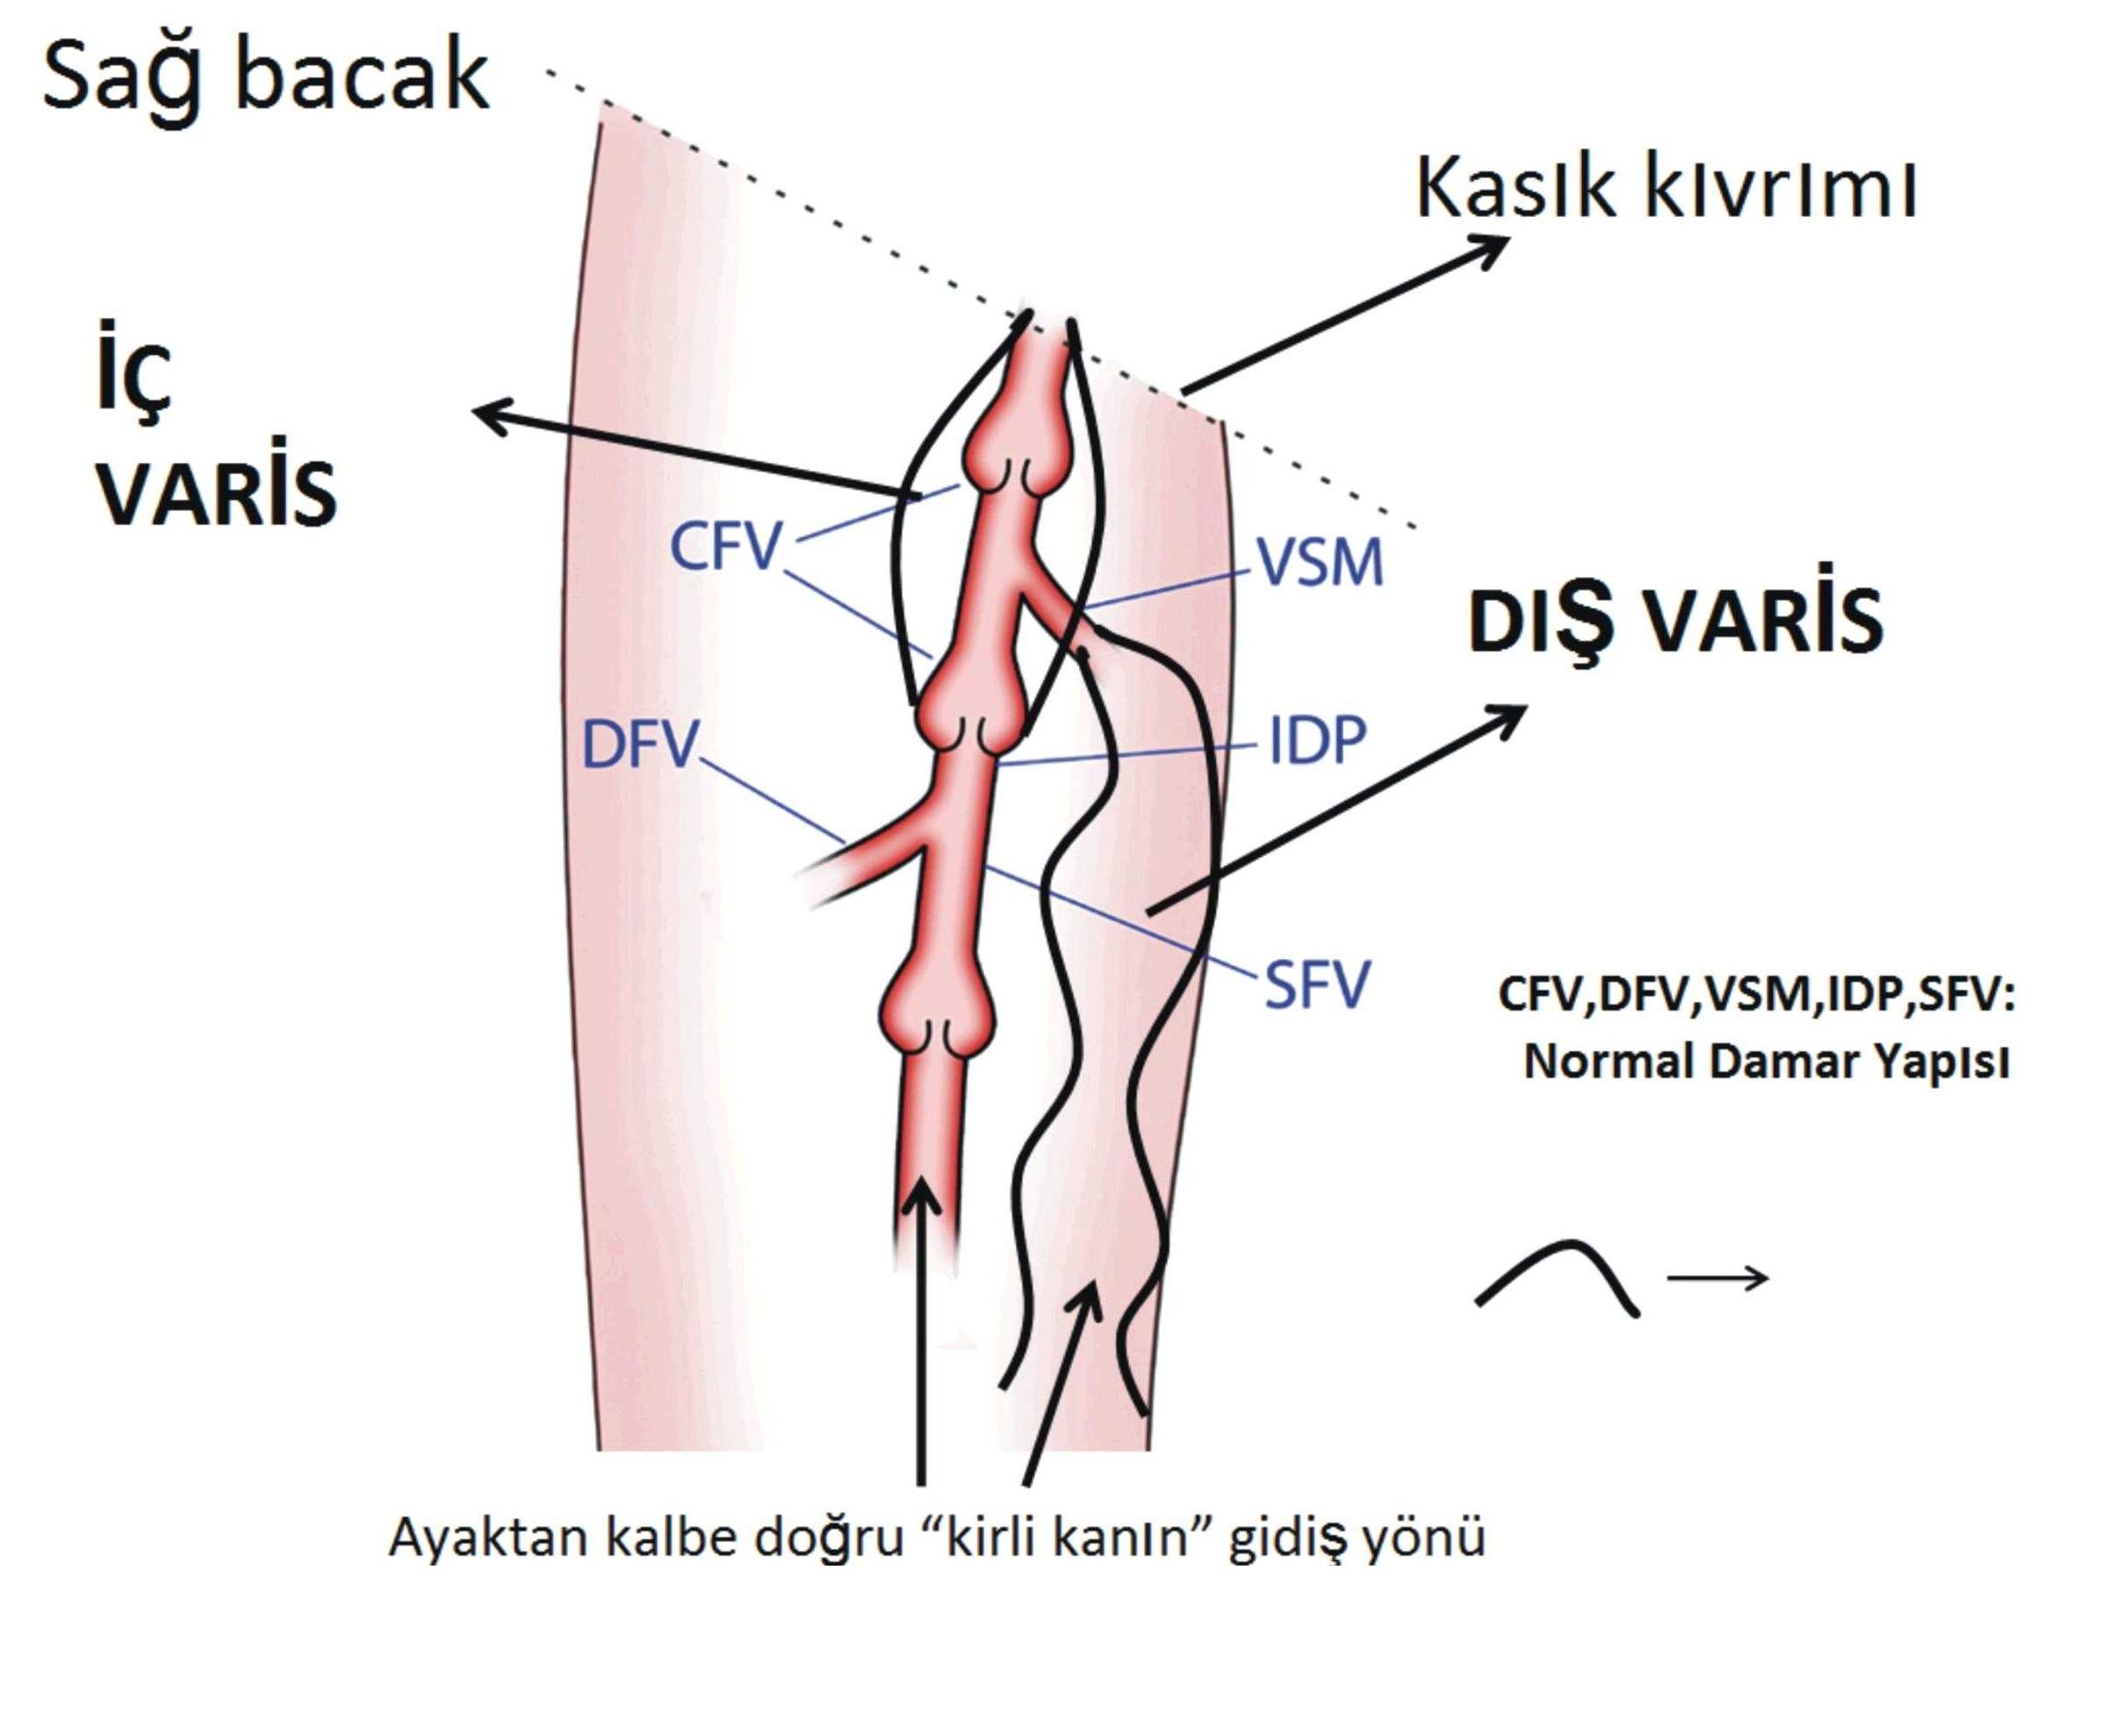 Meslek hastalığı: Varis